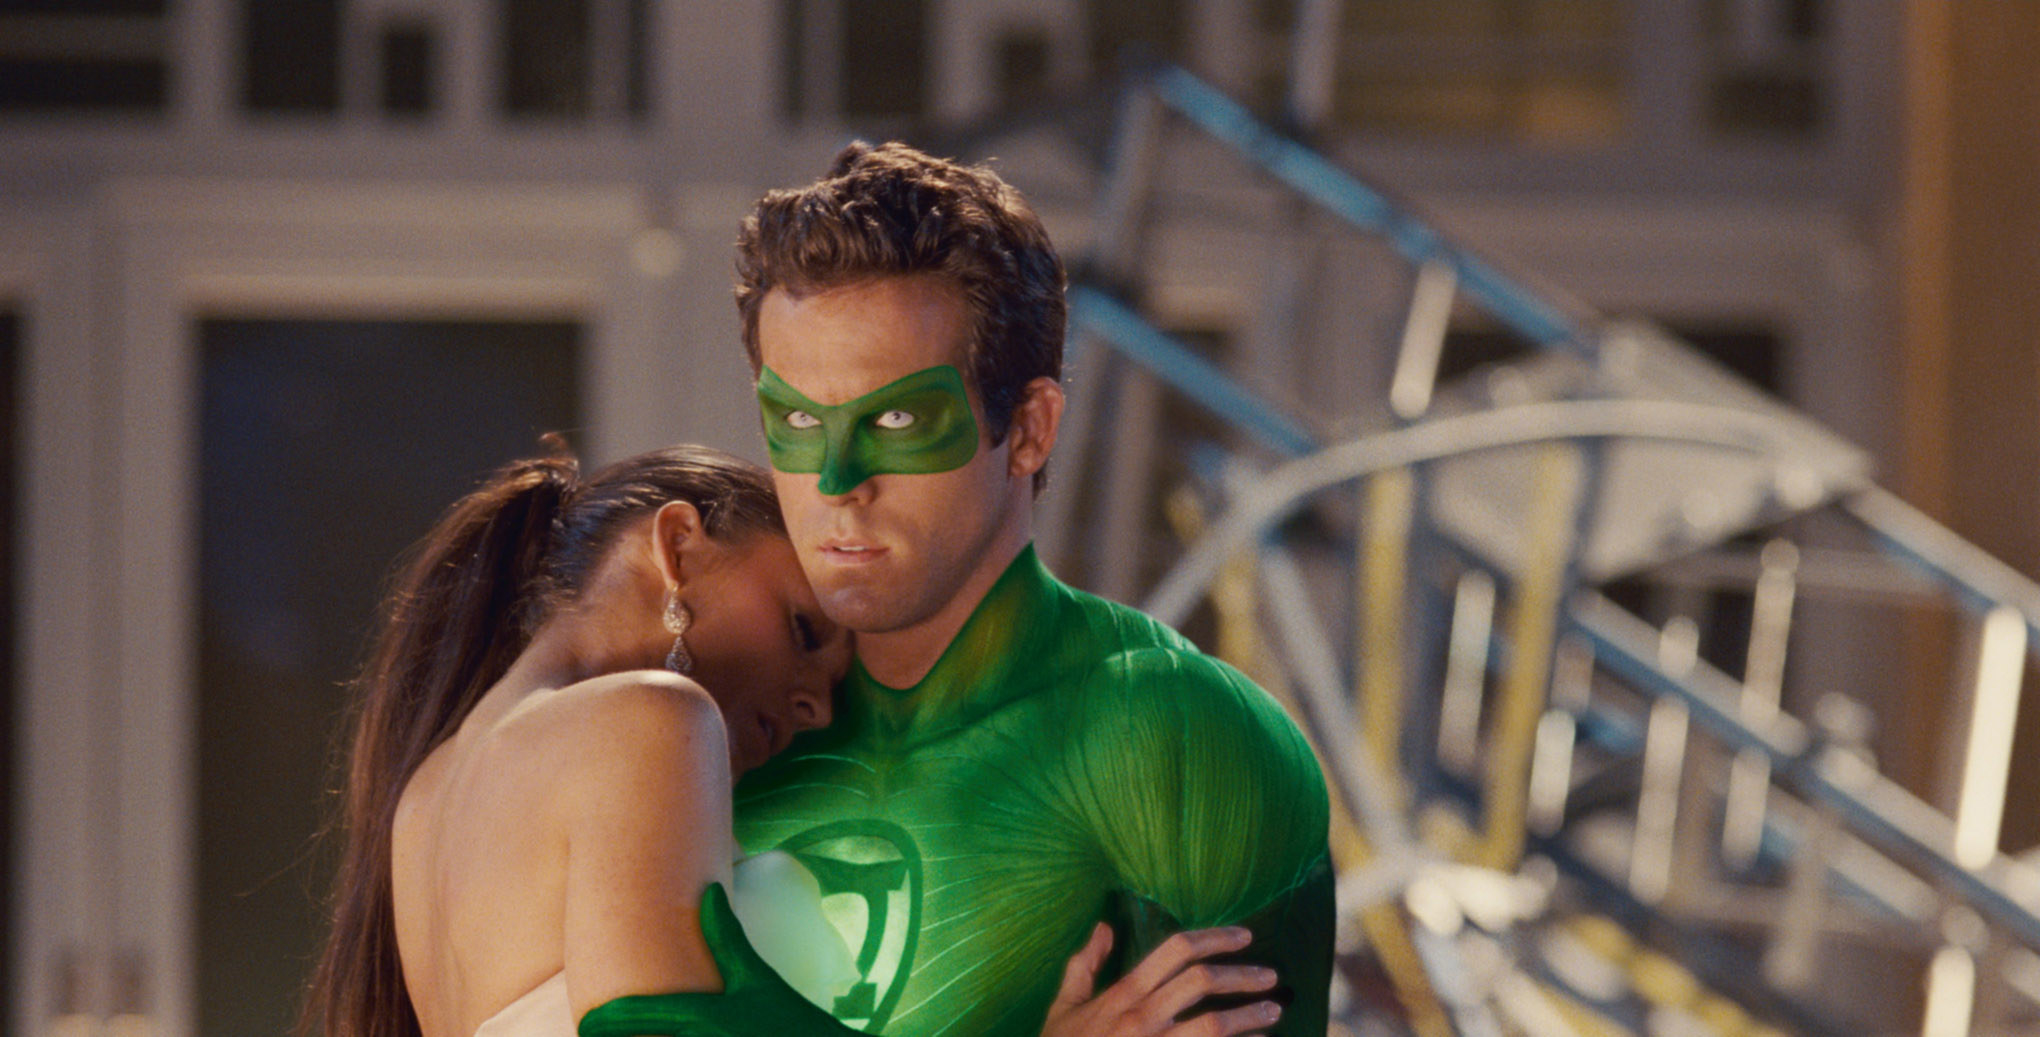 Blake Lively's character hugging Ryan Reynolds's character Green Lantern